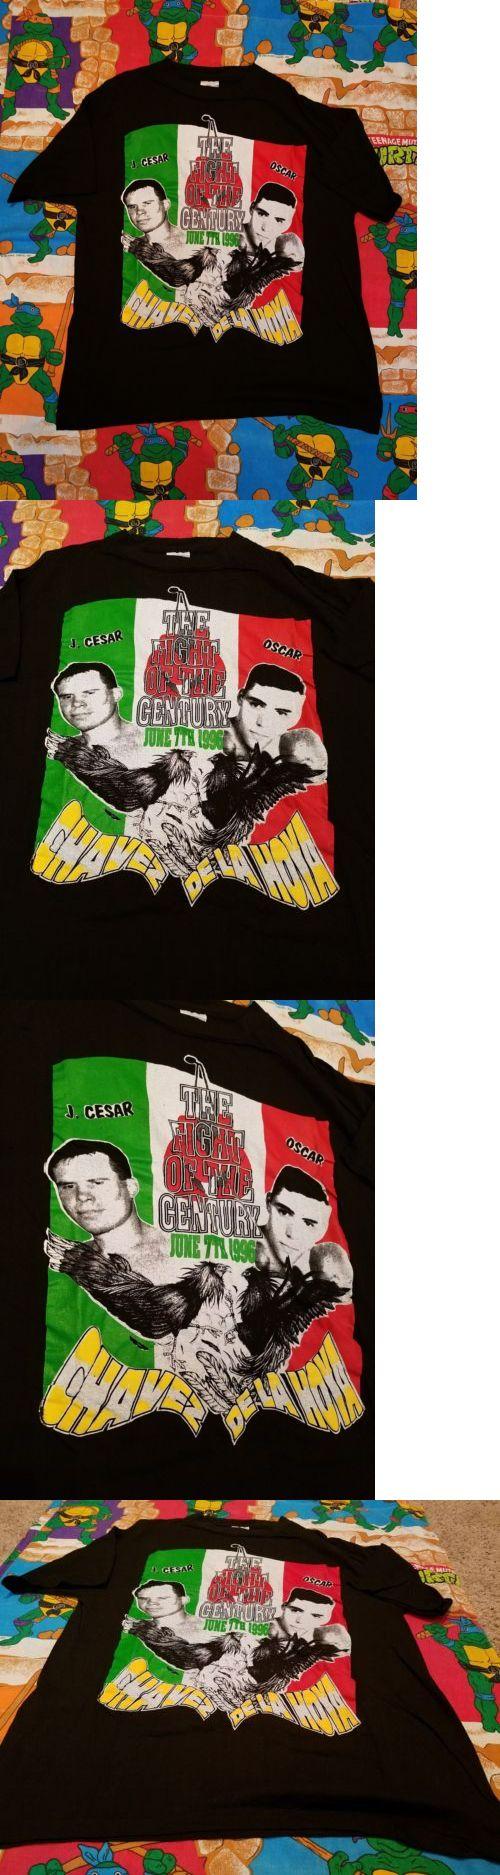 Boxing 1227: Julio Cesar Chavez Oscar De La Hoya The Fight June 7Th 1996 Vtg Boxing Shirt Xl -> BUY IT NOW ONLY: $199.99 on eBay!